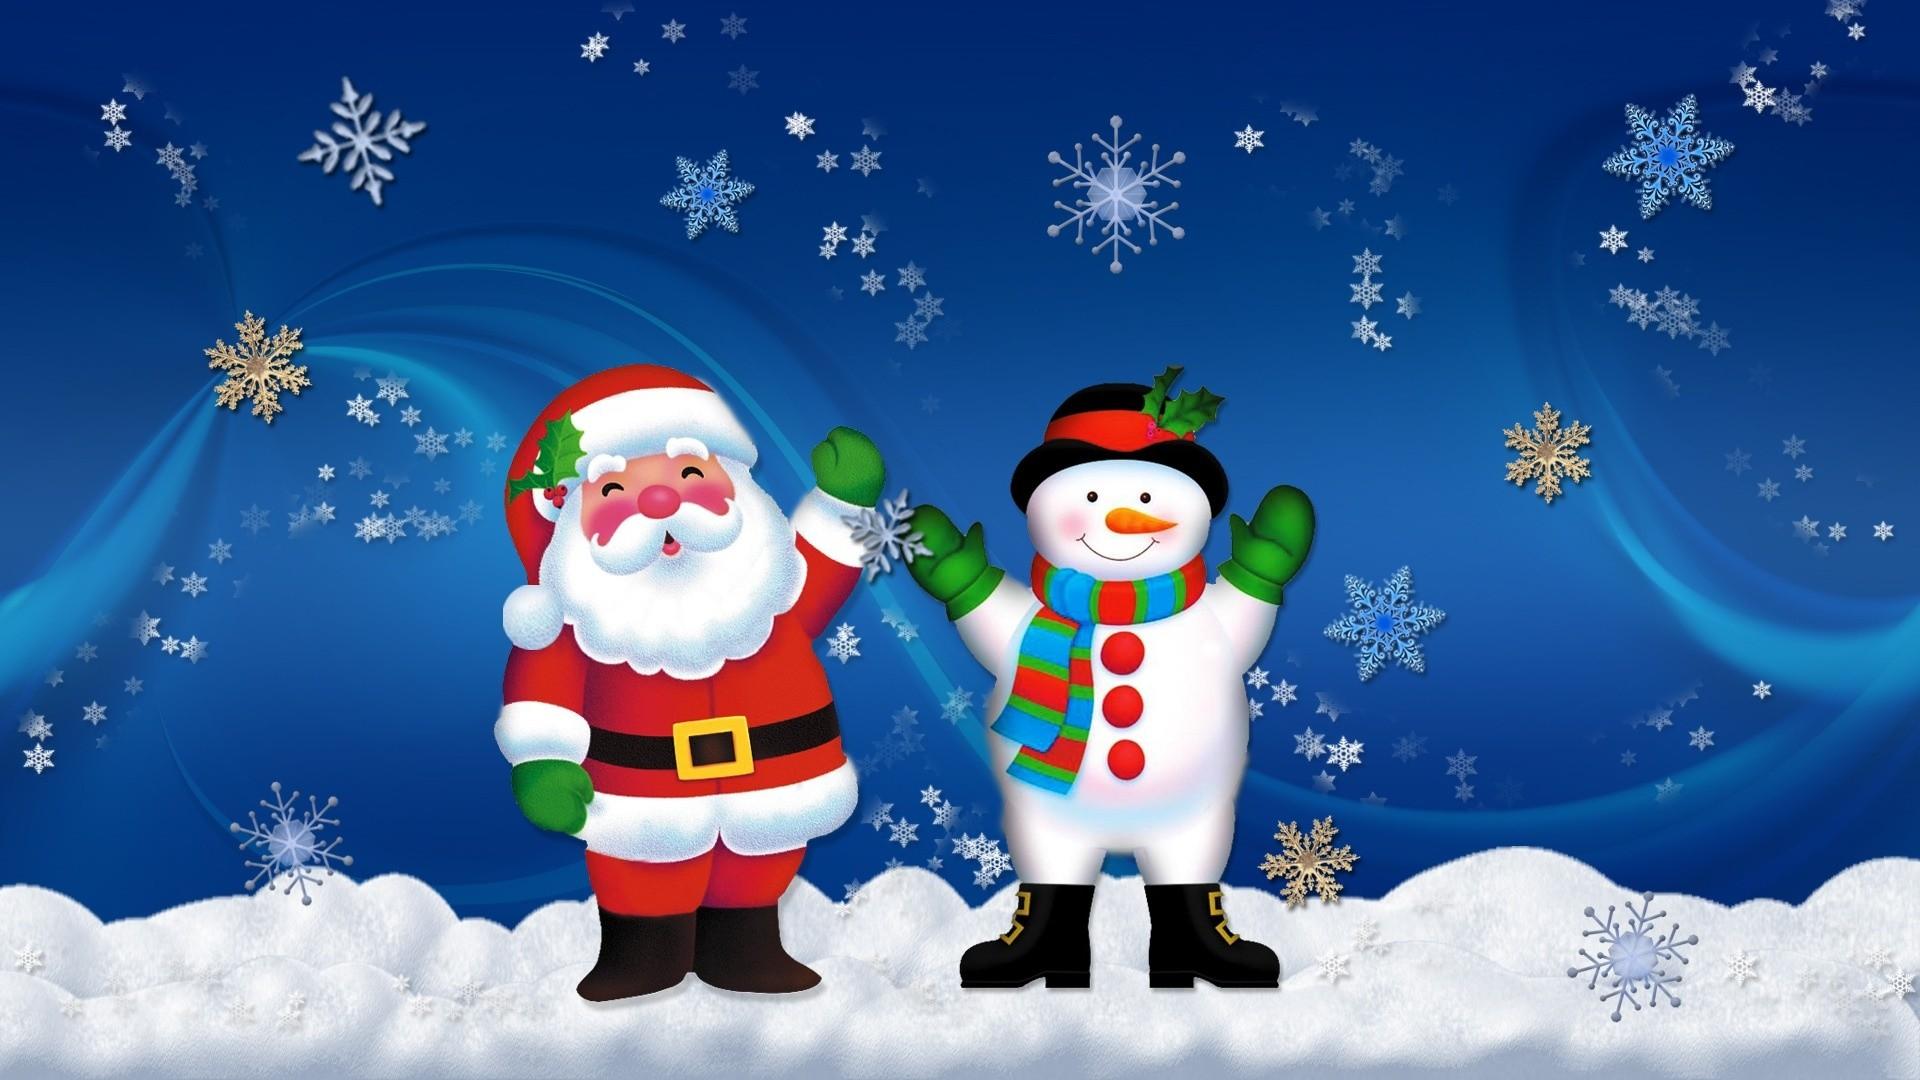 Res: 1920x1080, Funny Christmas Wallpaper Desktop